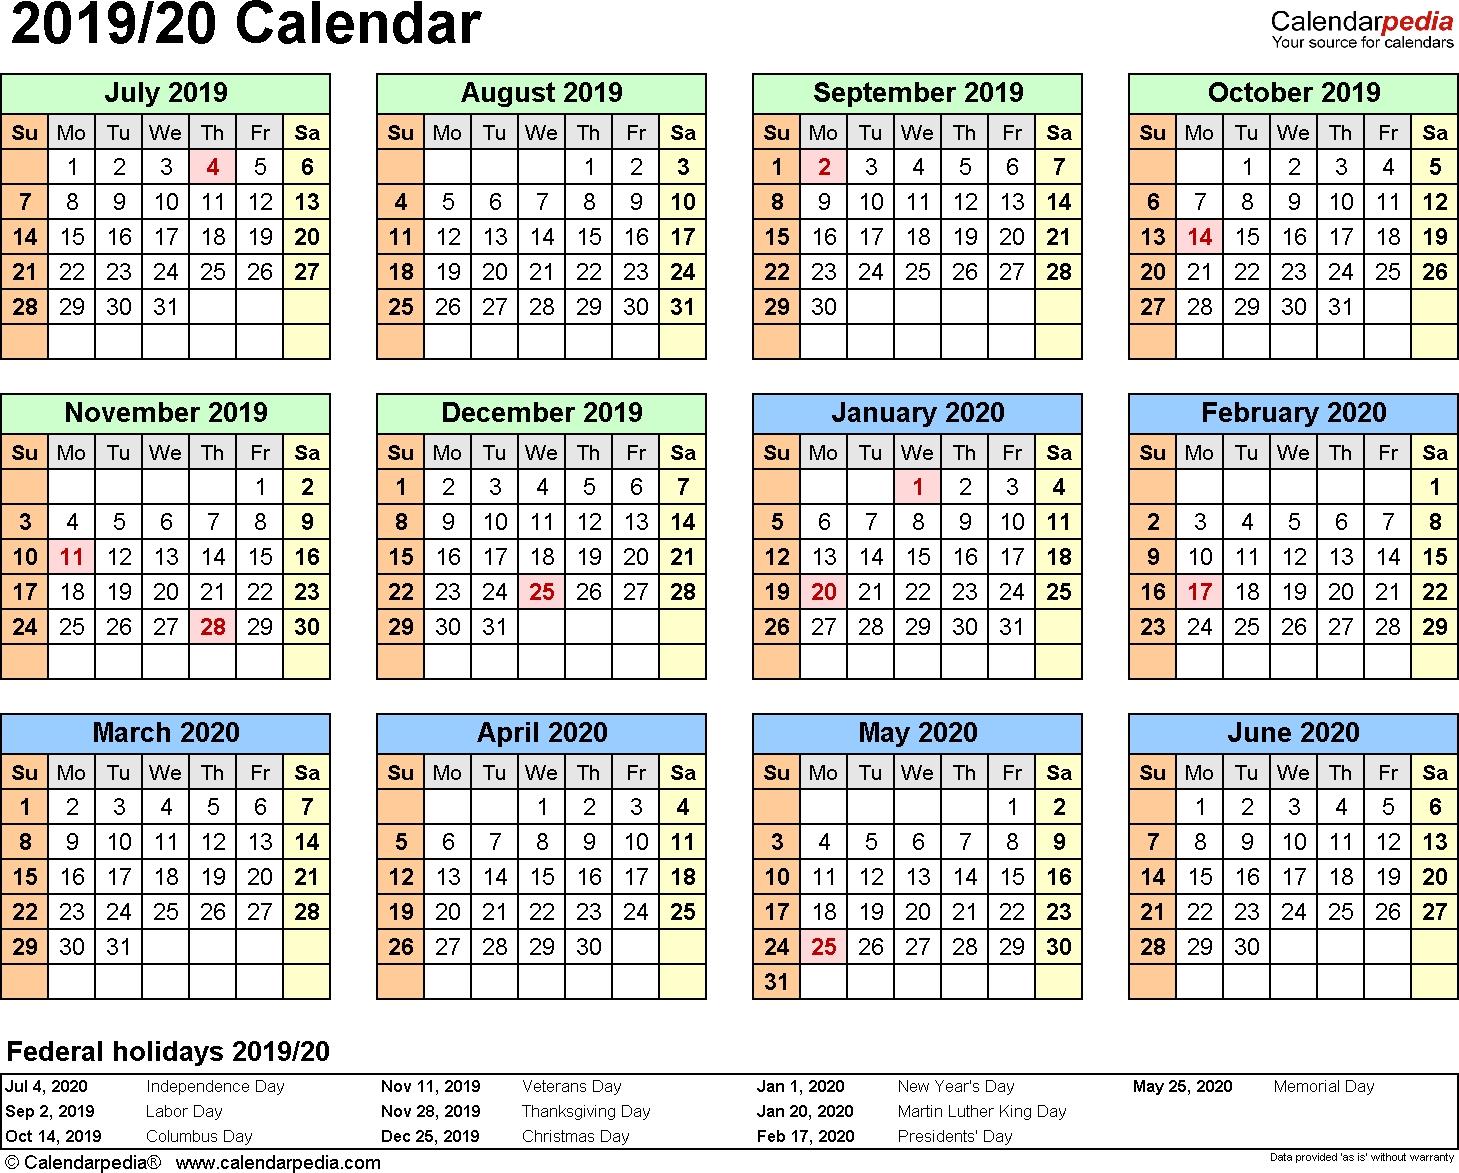 Split Year Calendar 2019/20 (July To June) - Word Templates-January 2020 Calendar Japan